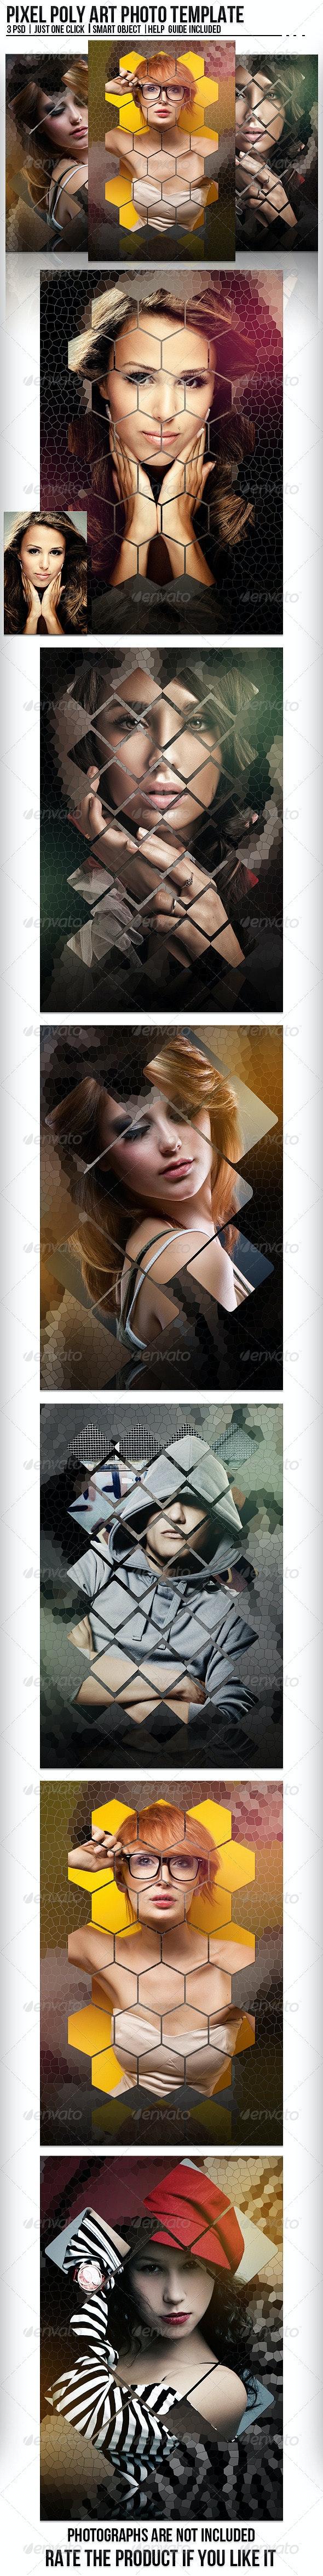 Pixel Poly Art Photo Template - Artistic Photo Templates